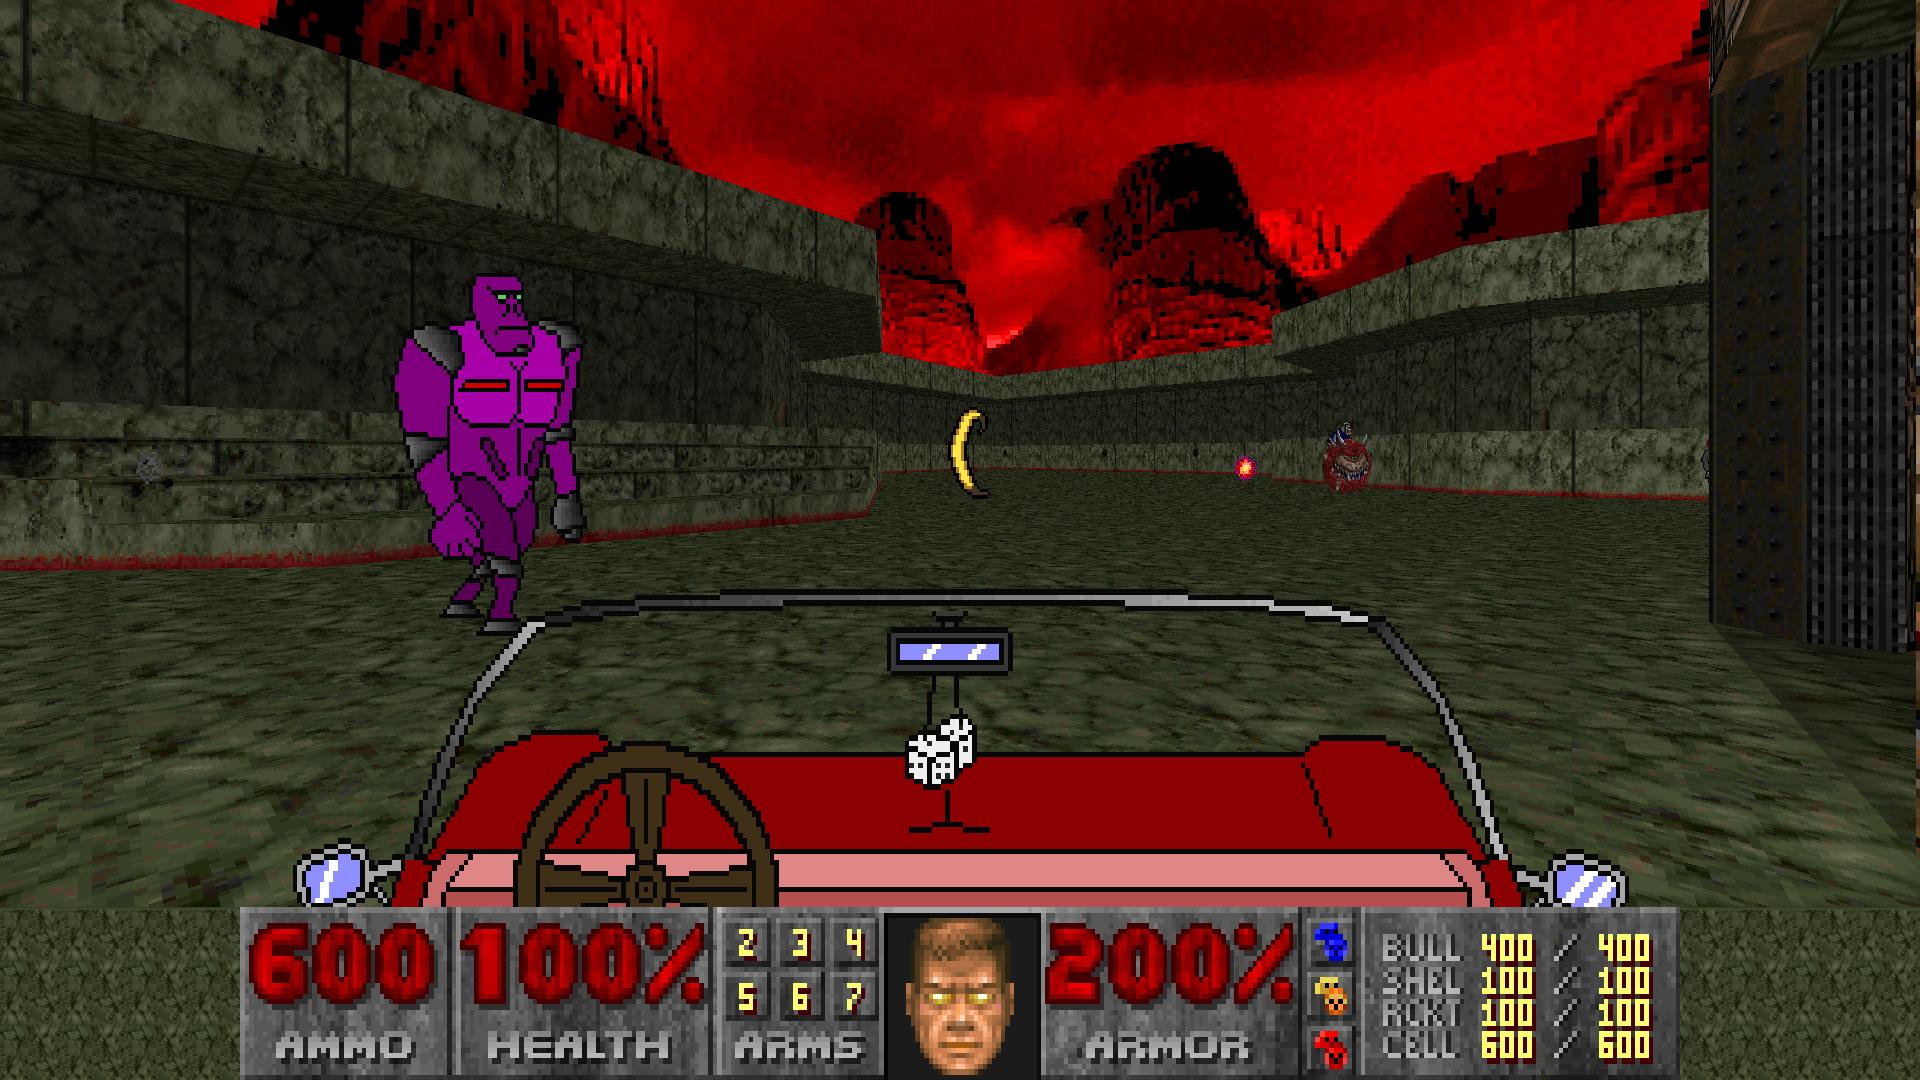 Screenshot_Doom_20190328_075034.png.87abb0f04af3ad4e083ab37af45a5855.png